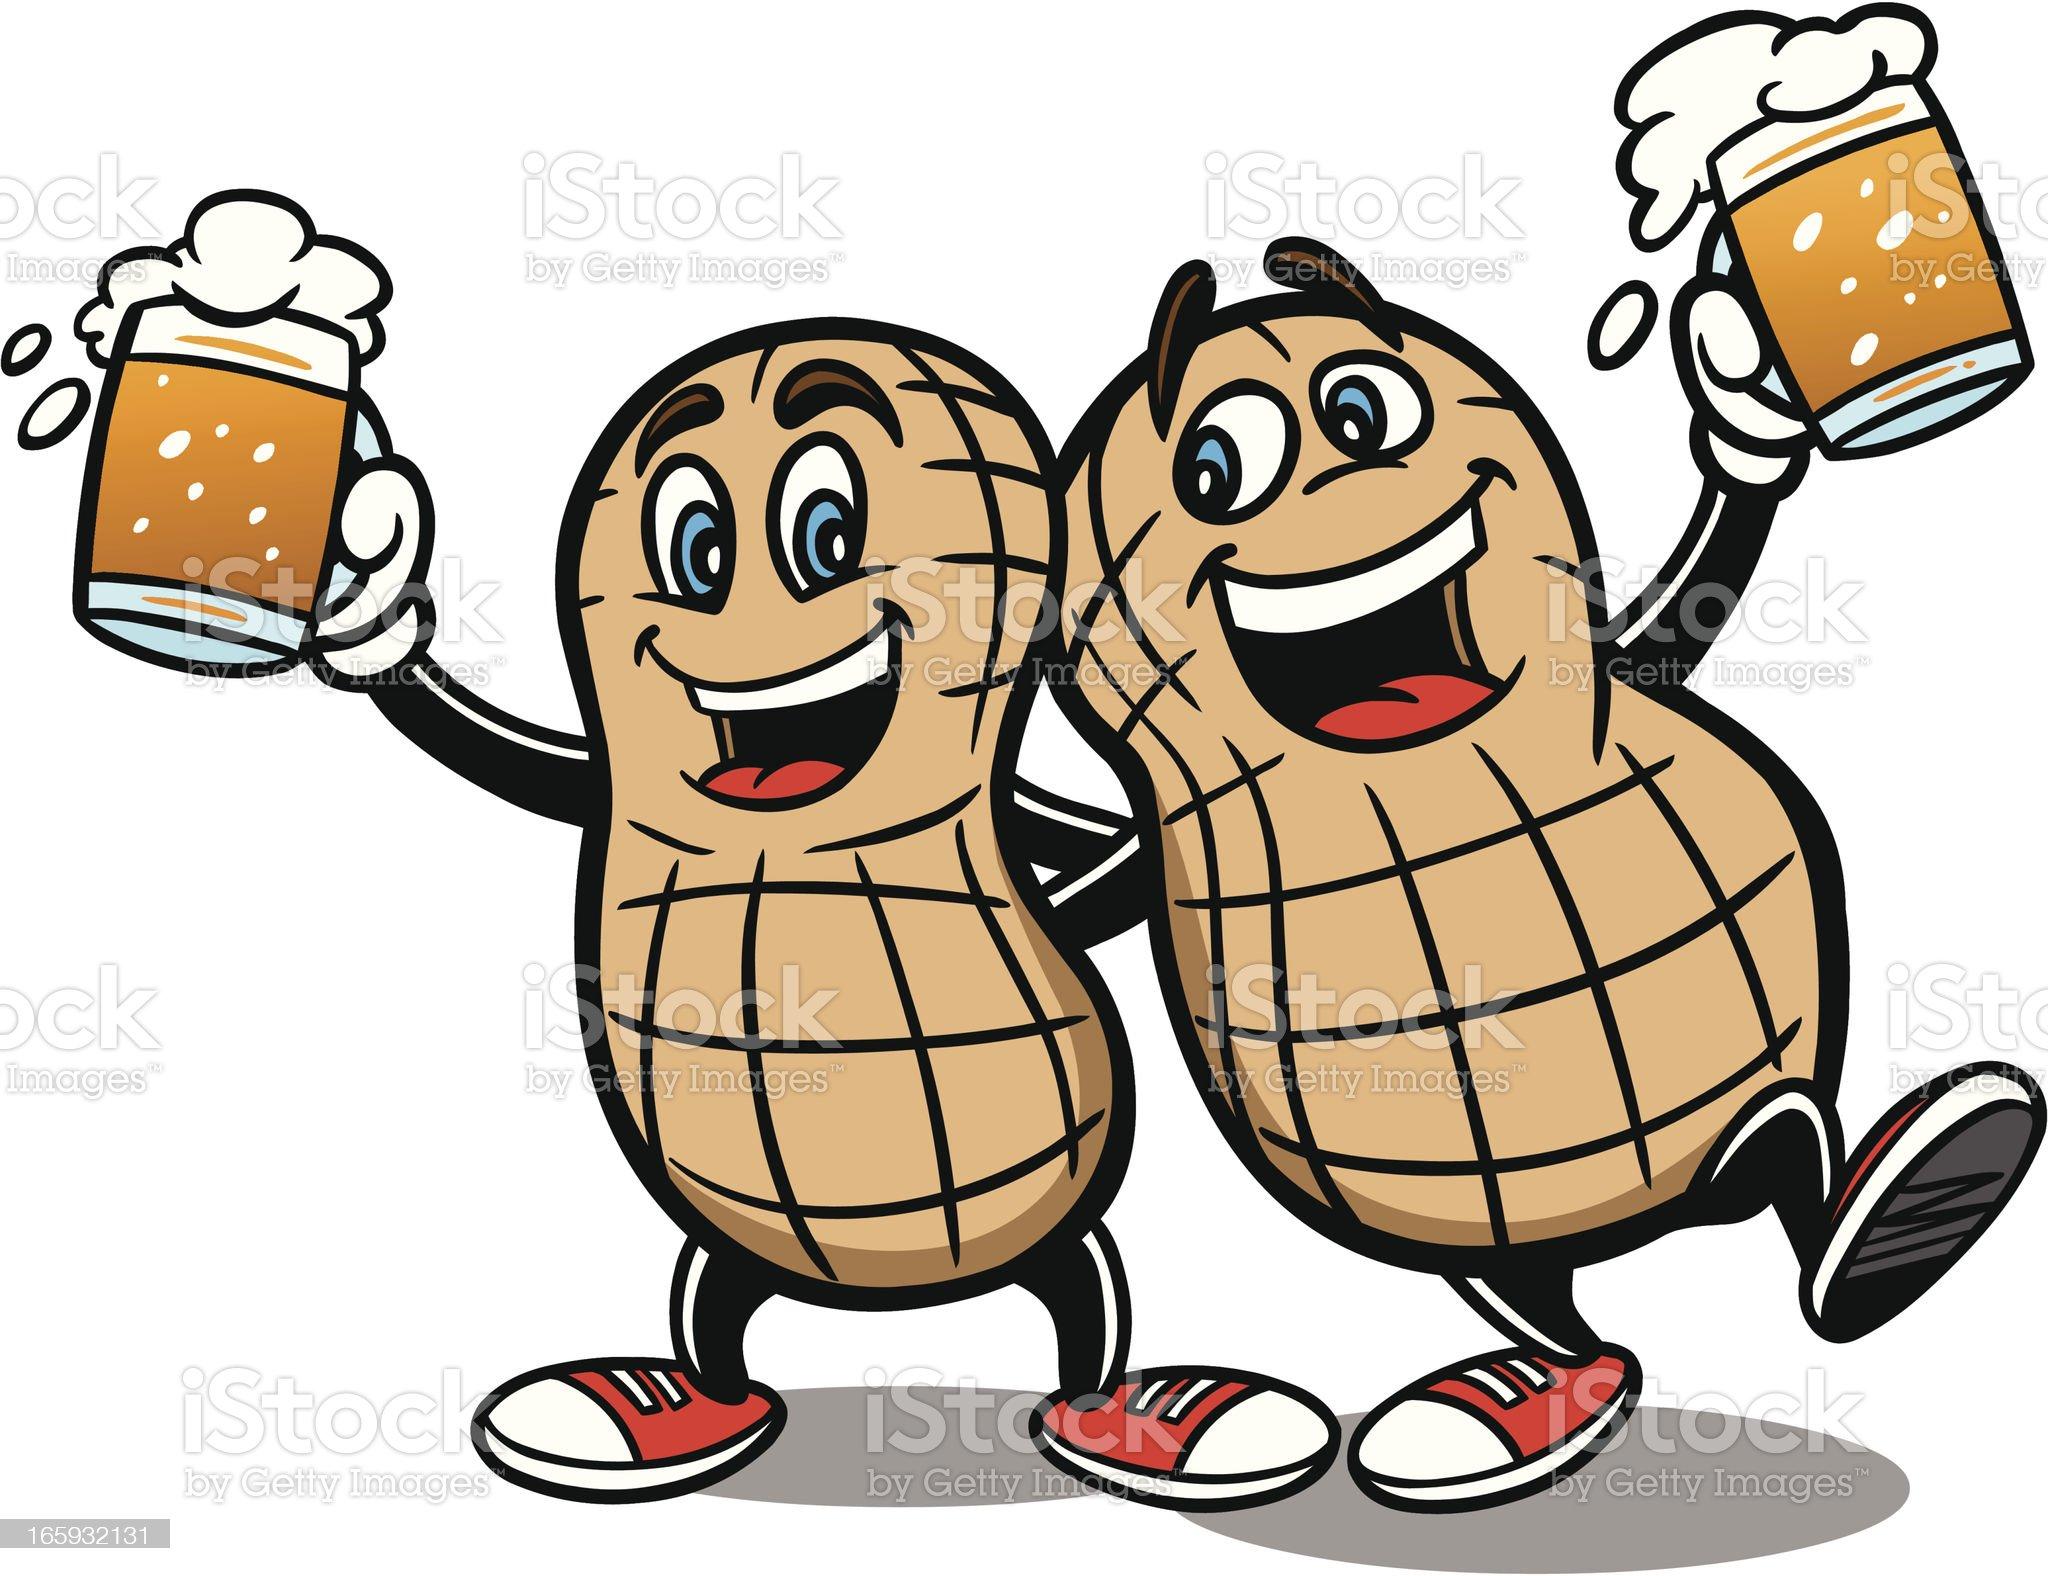 Beer Nuts royalty-free stock vector art